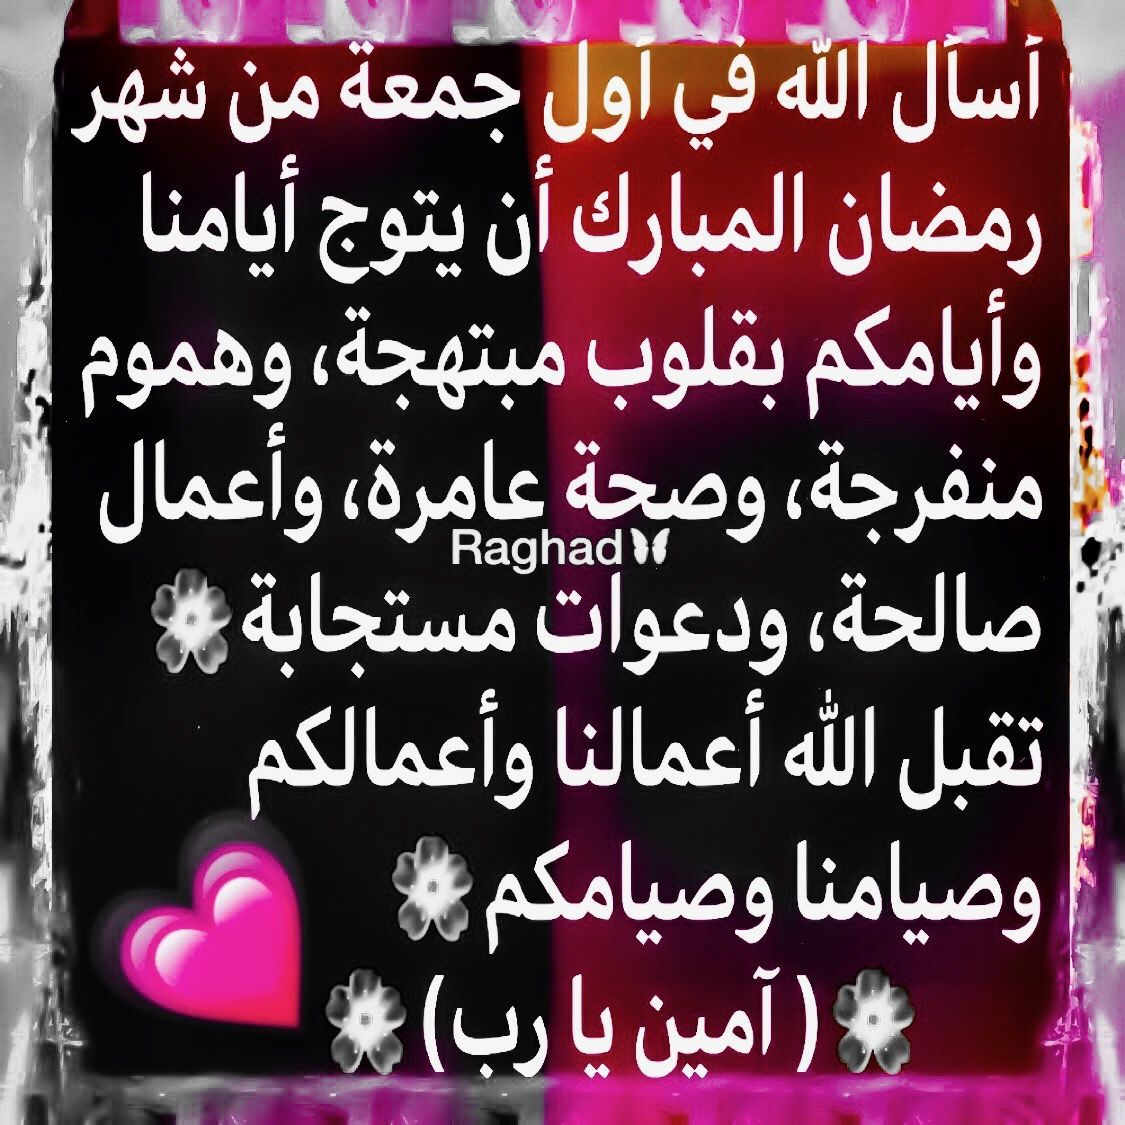 Desertrose أسأل الله في أول جمعة من شهر رمضان المبارك أن يتوج أيامنا وأيامكم بقلوب مبتهجة وهموم منفرجة وصحة عامرة وأعمال Ramadan Ramadan Kareem Kareem